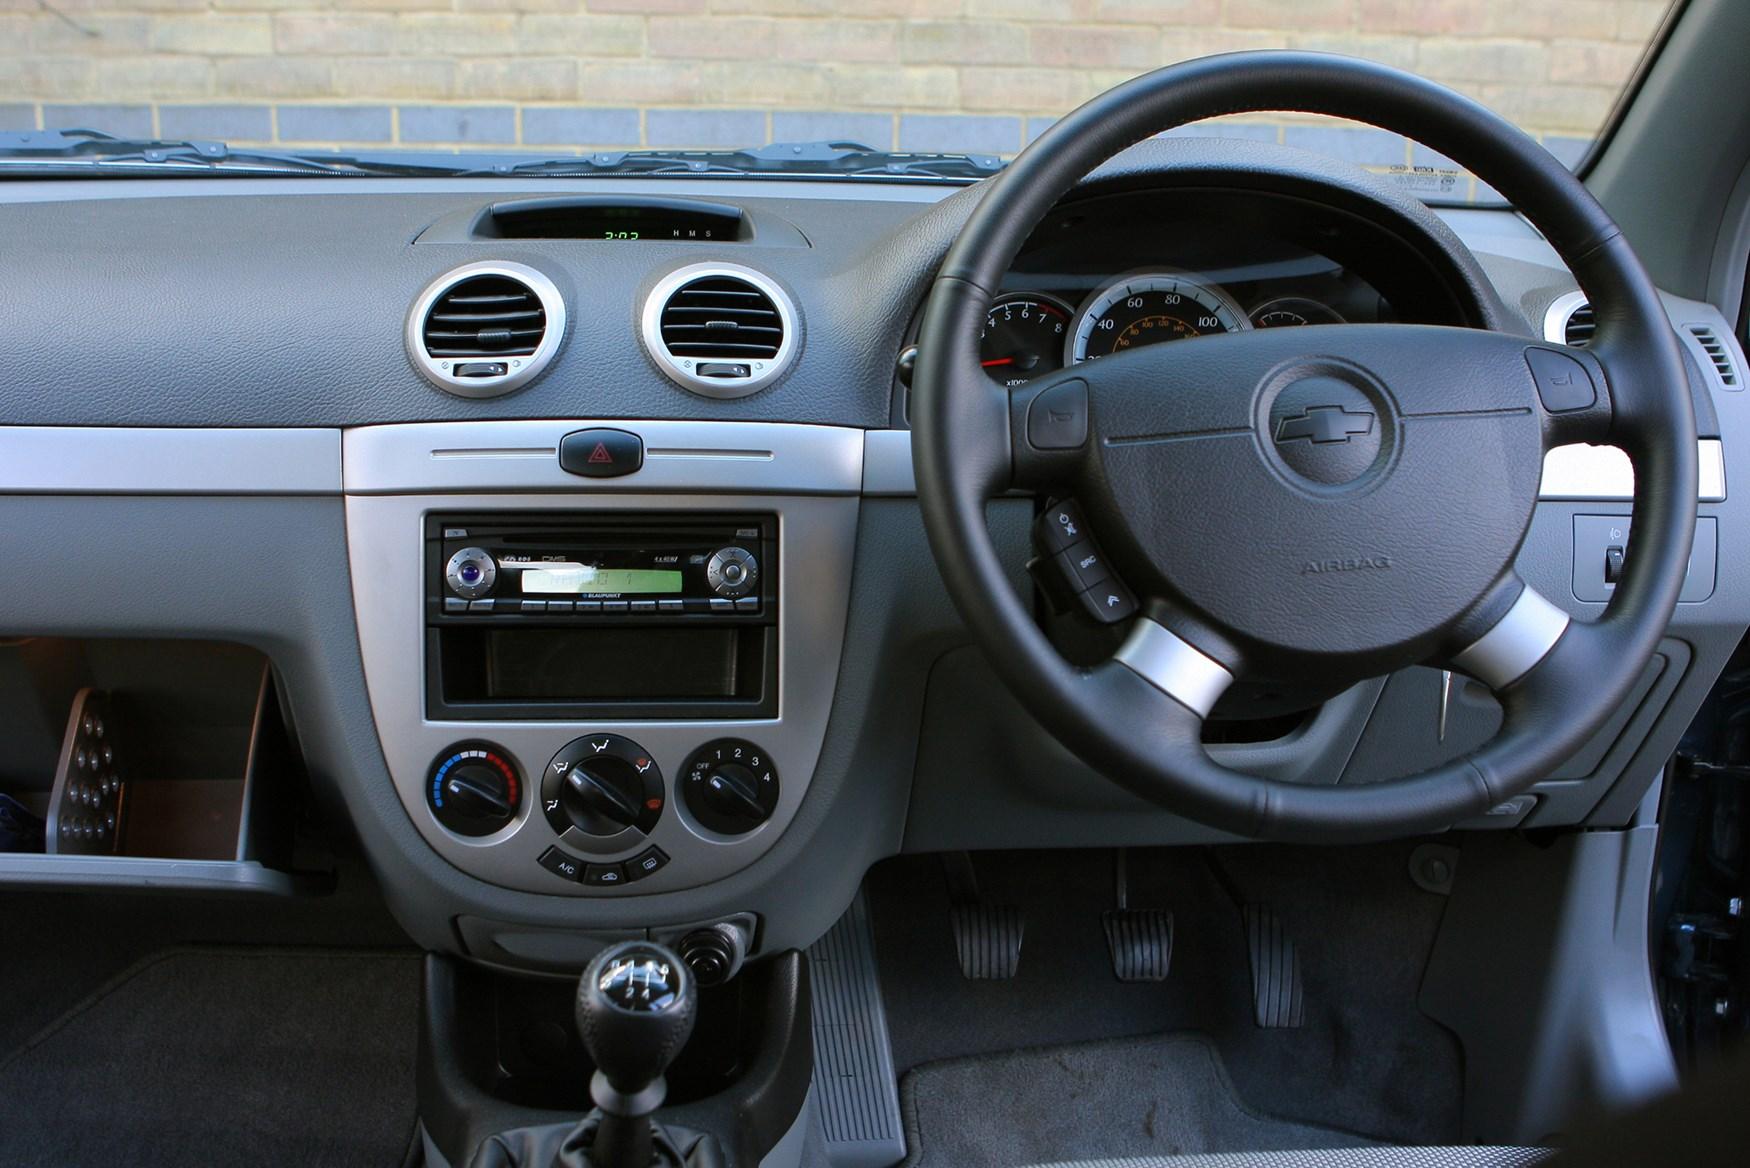 Chevrolet Lacetti Hatchback Review (2005 - 2011) | Parkers